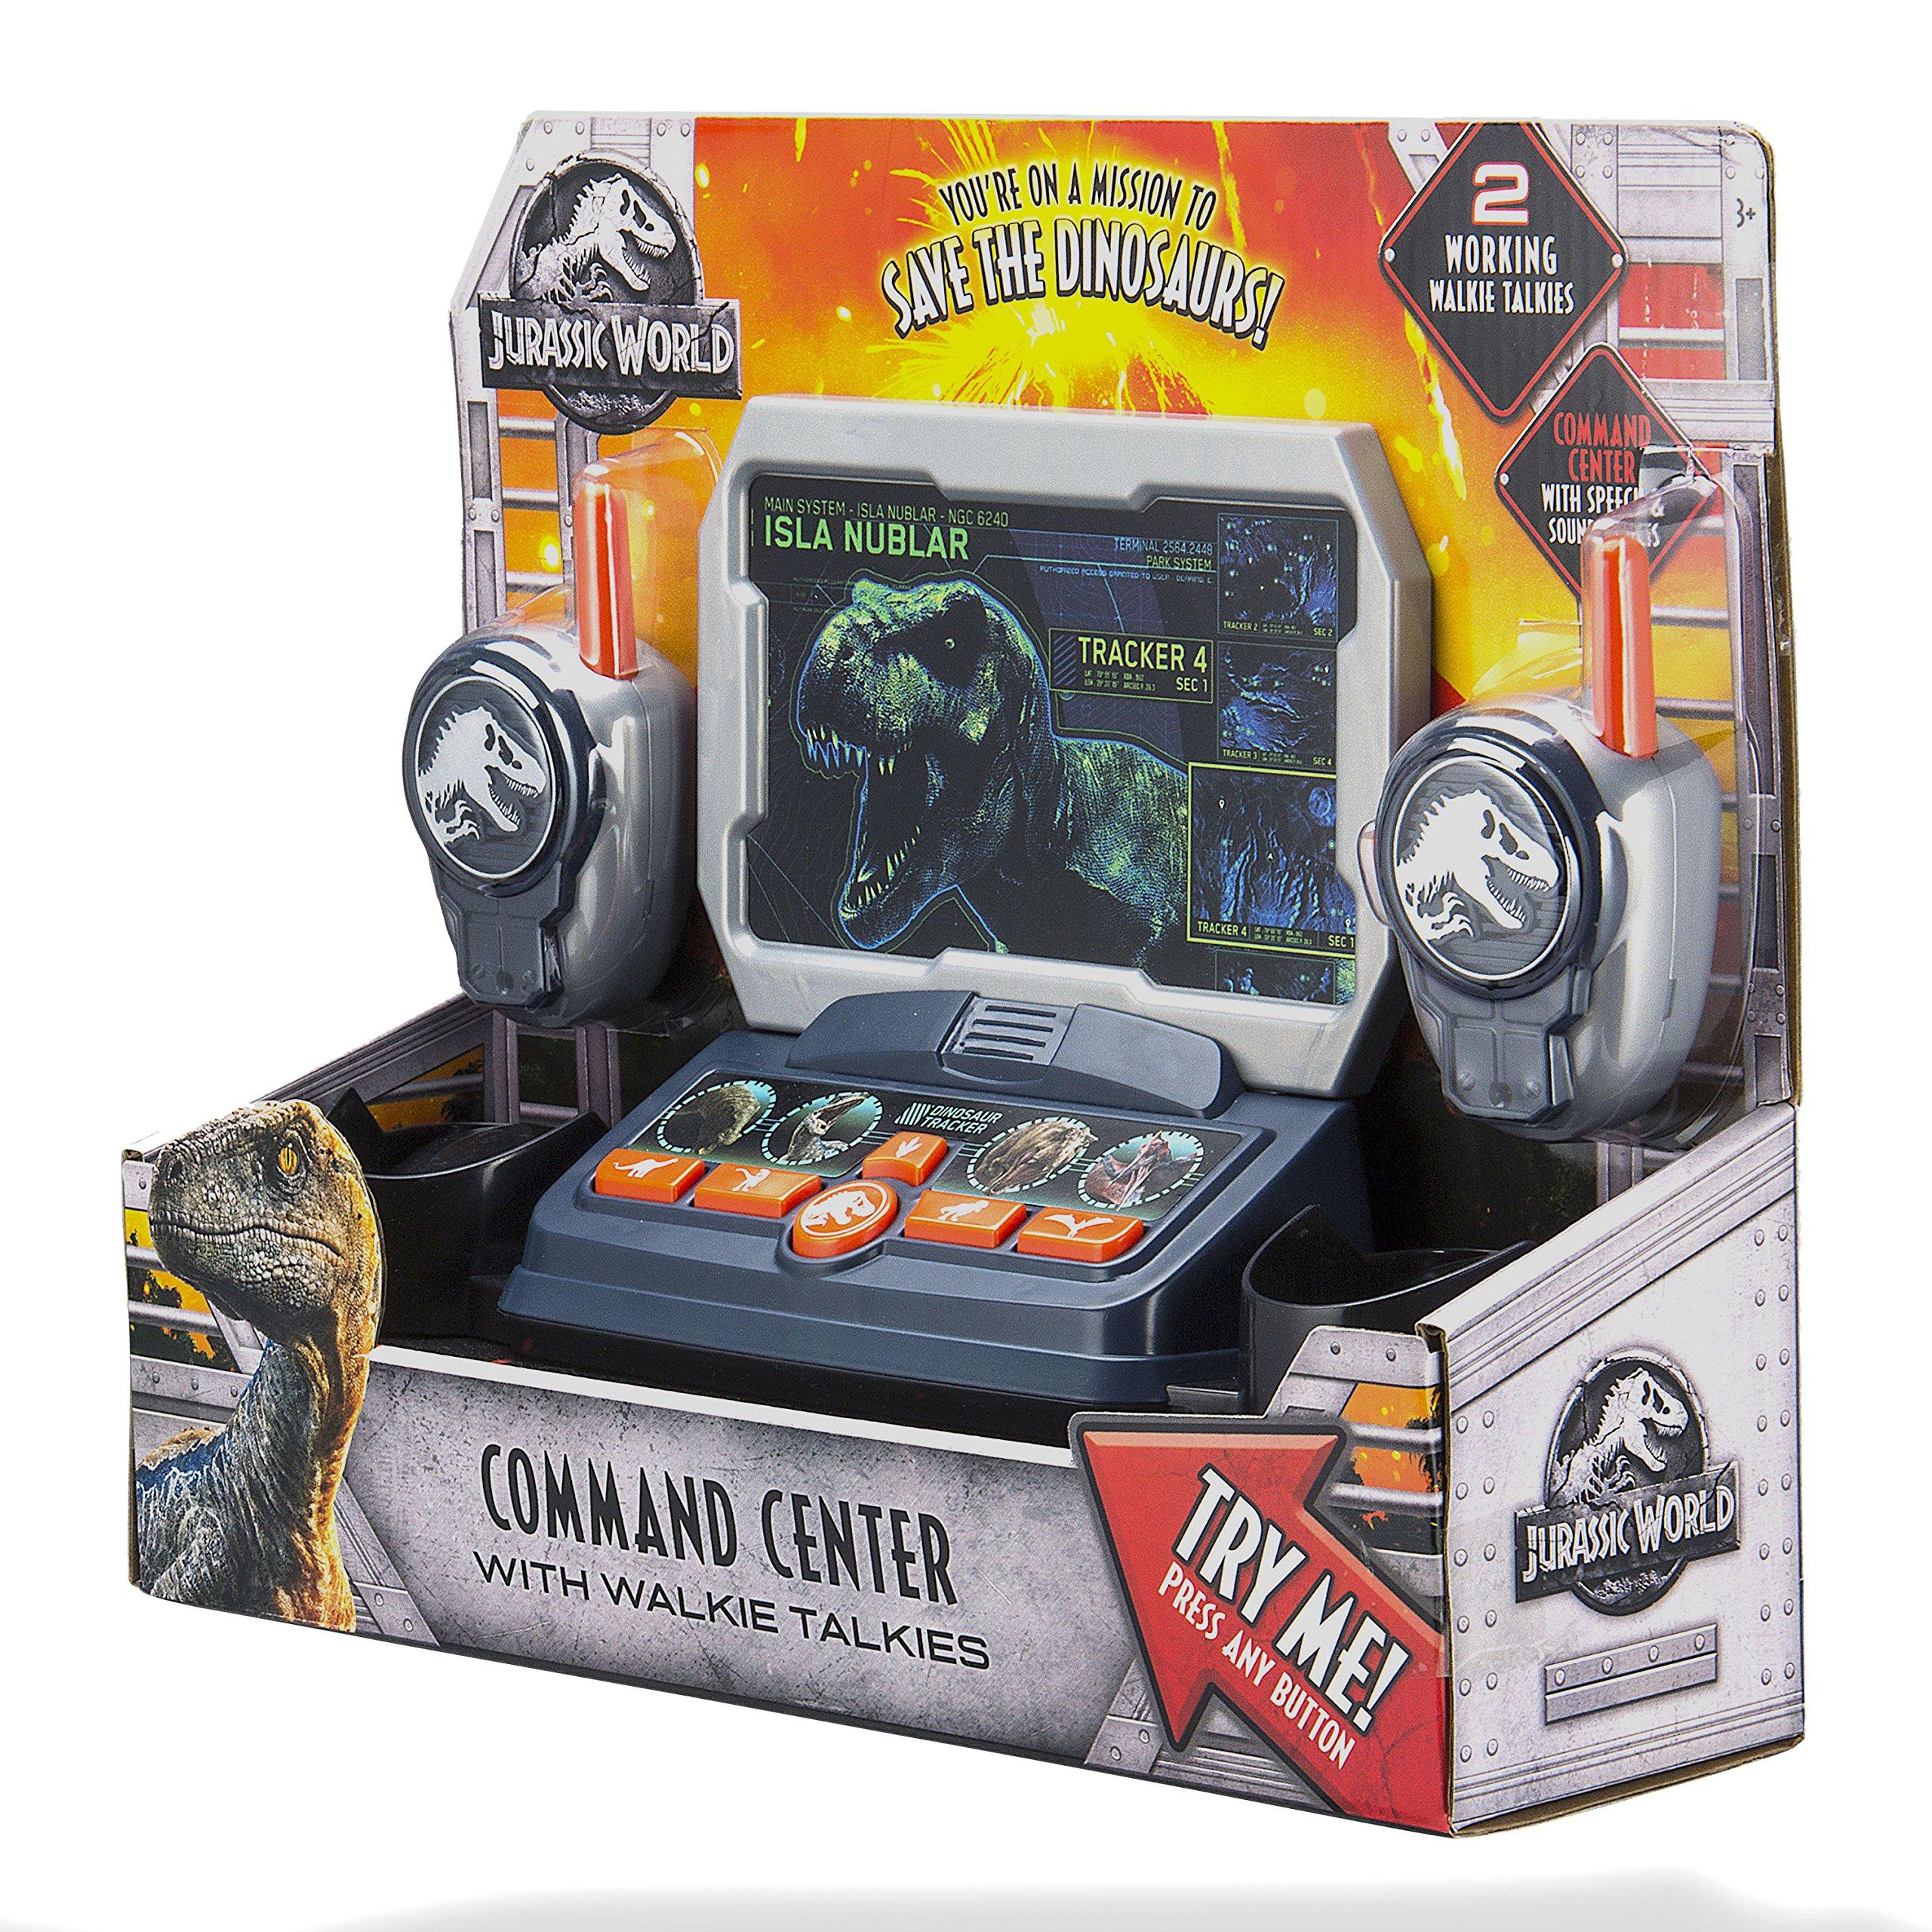 eKids Jurassic World 2 Command Center with Kid Friendly Walkie Talkies and Speech & Sound Effects by eKids (Image #8)